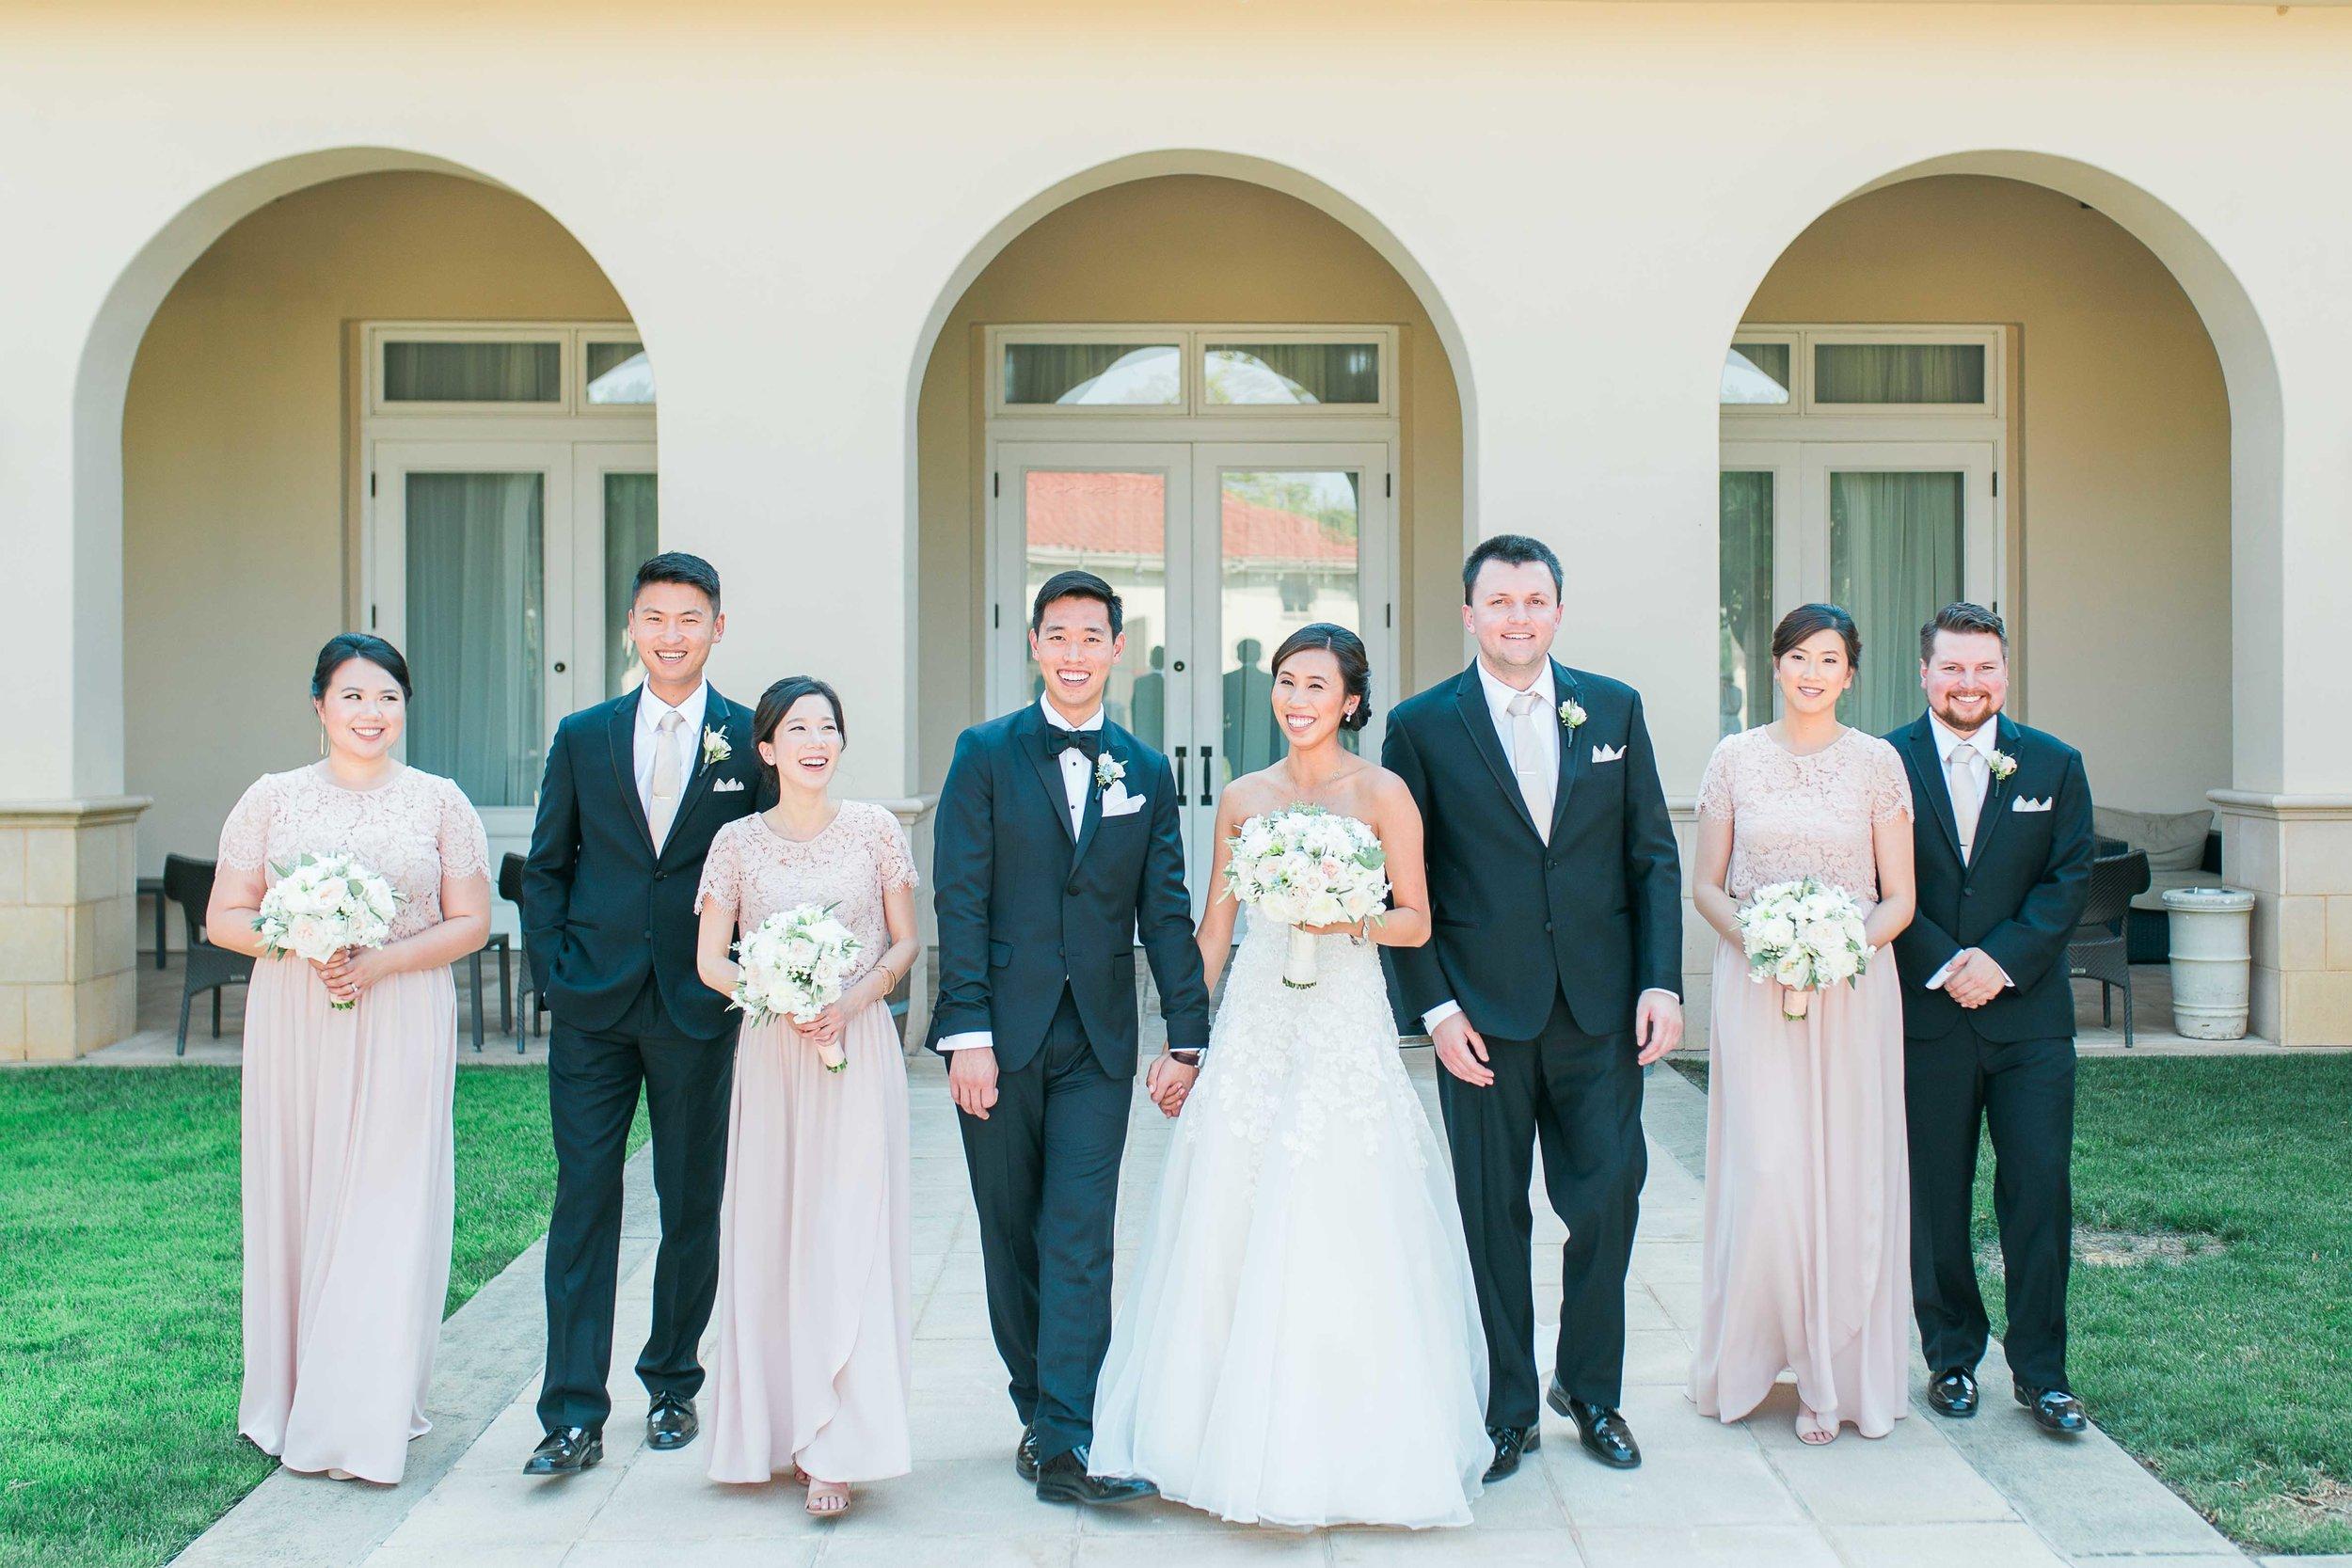 Ruby Hill Wedding Photos by JBJ Pictures - San Francisco Wedding Photographer - Pleasanton Wedding Venue (28).jpg